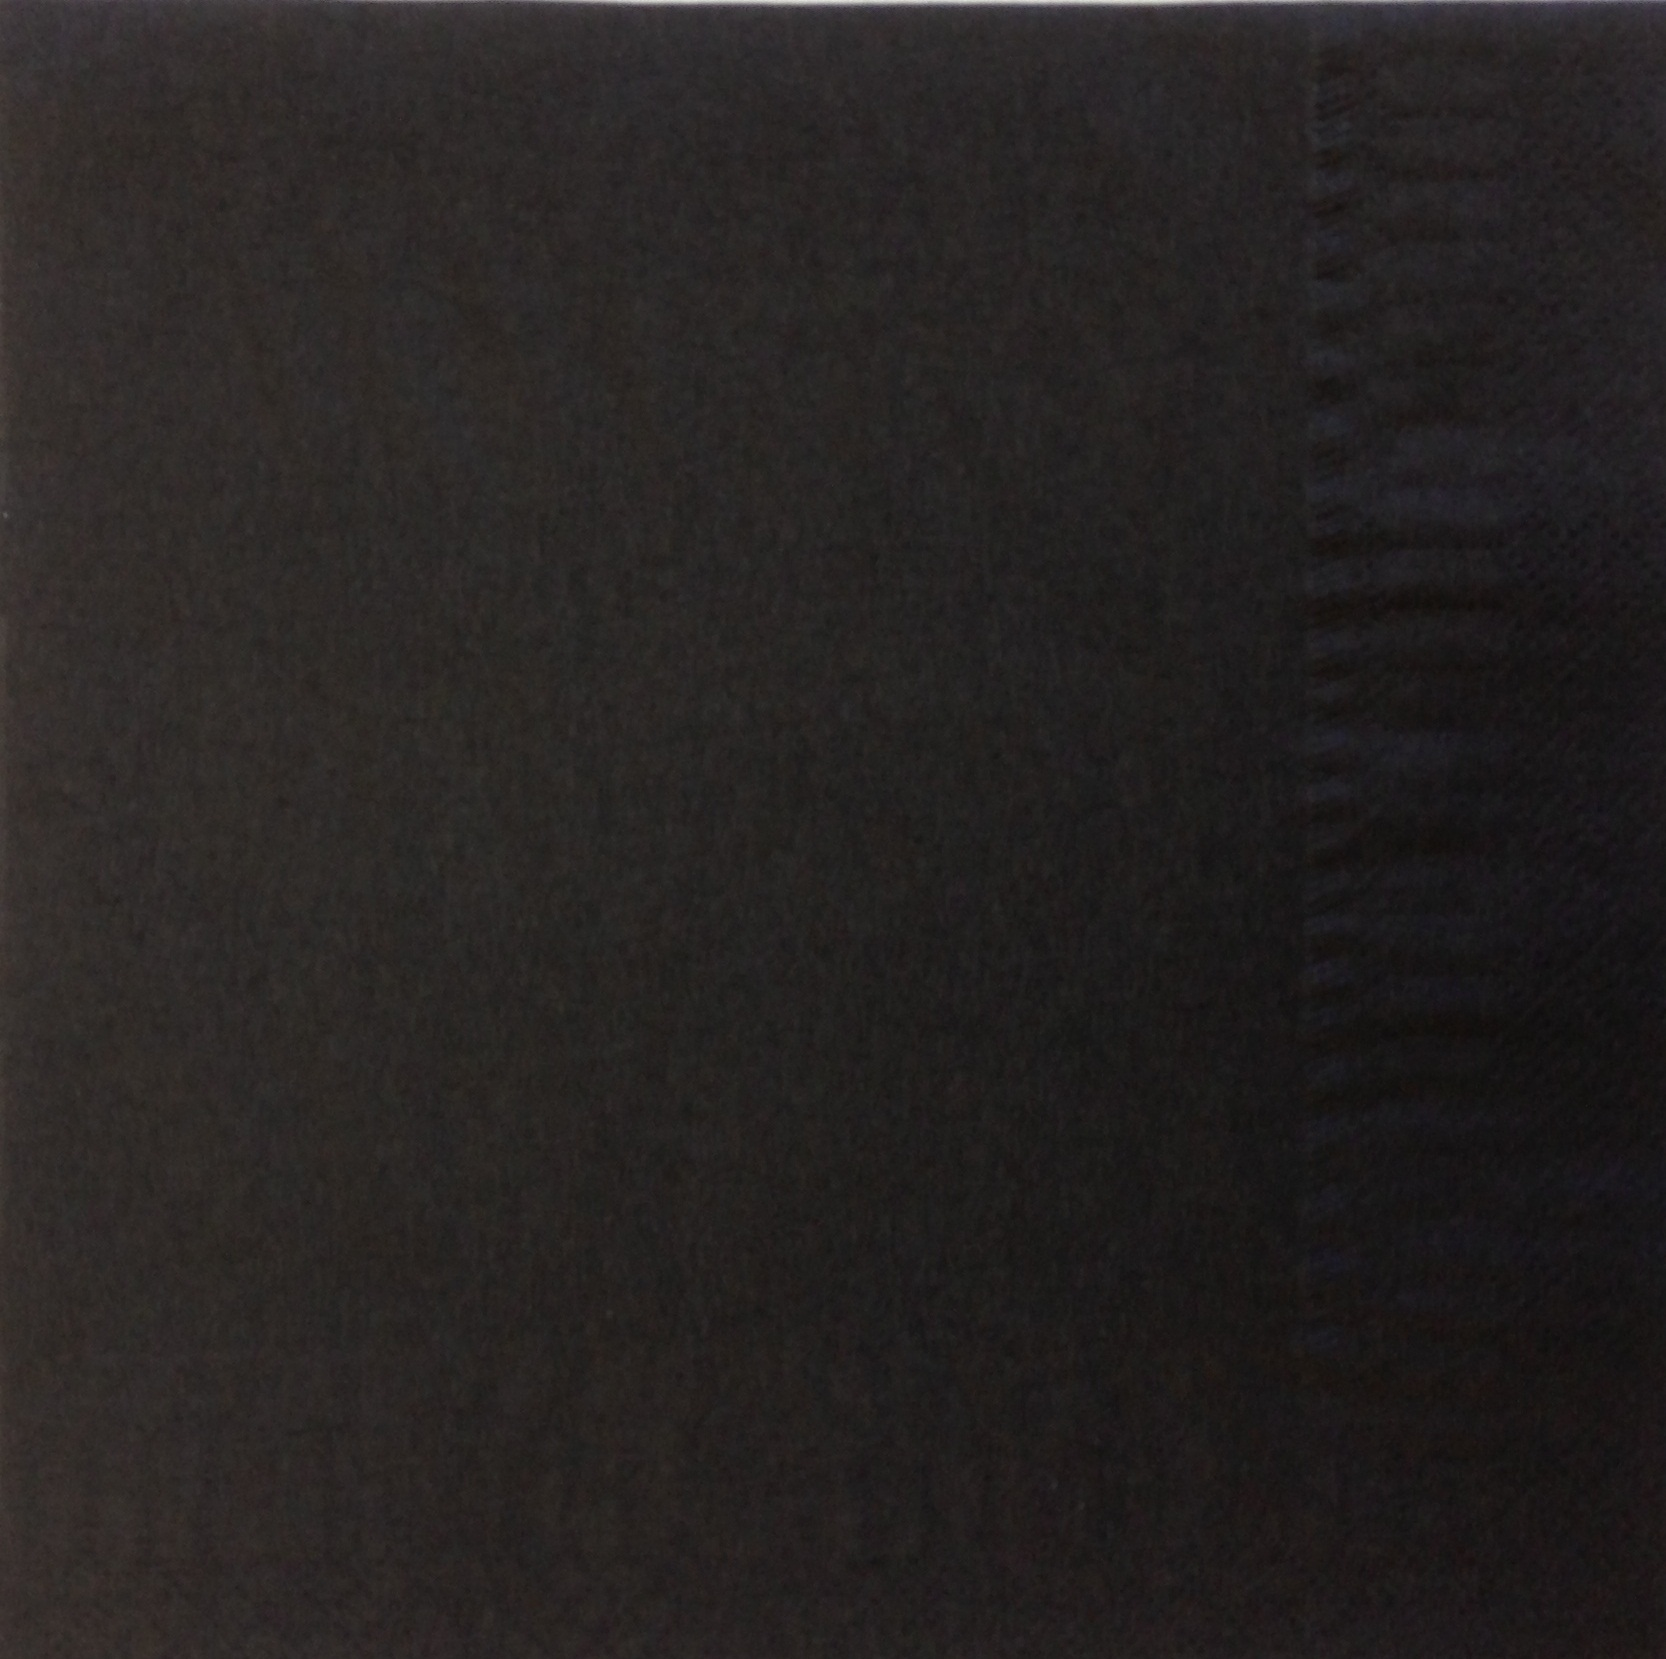 Black-Napkins-33cm-2ply---16x125--4-fold